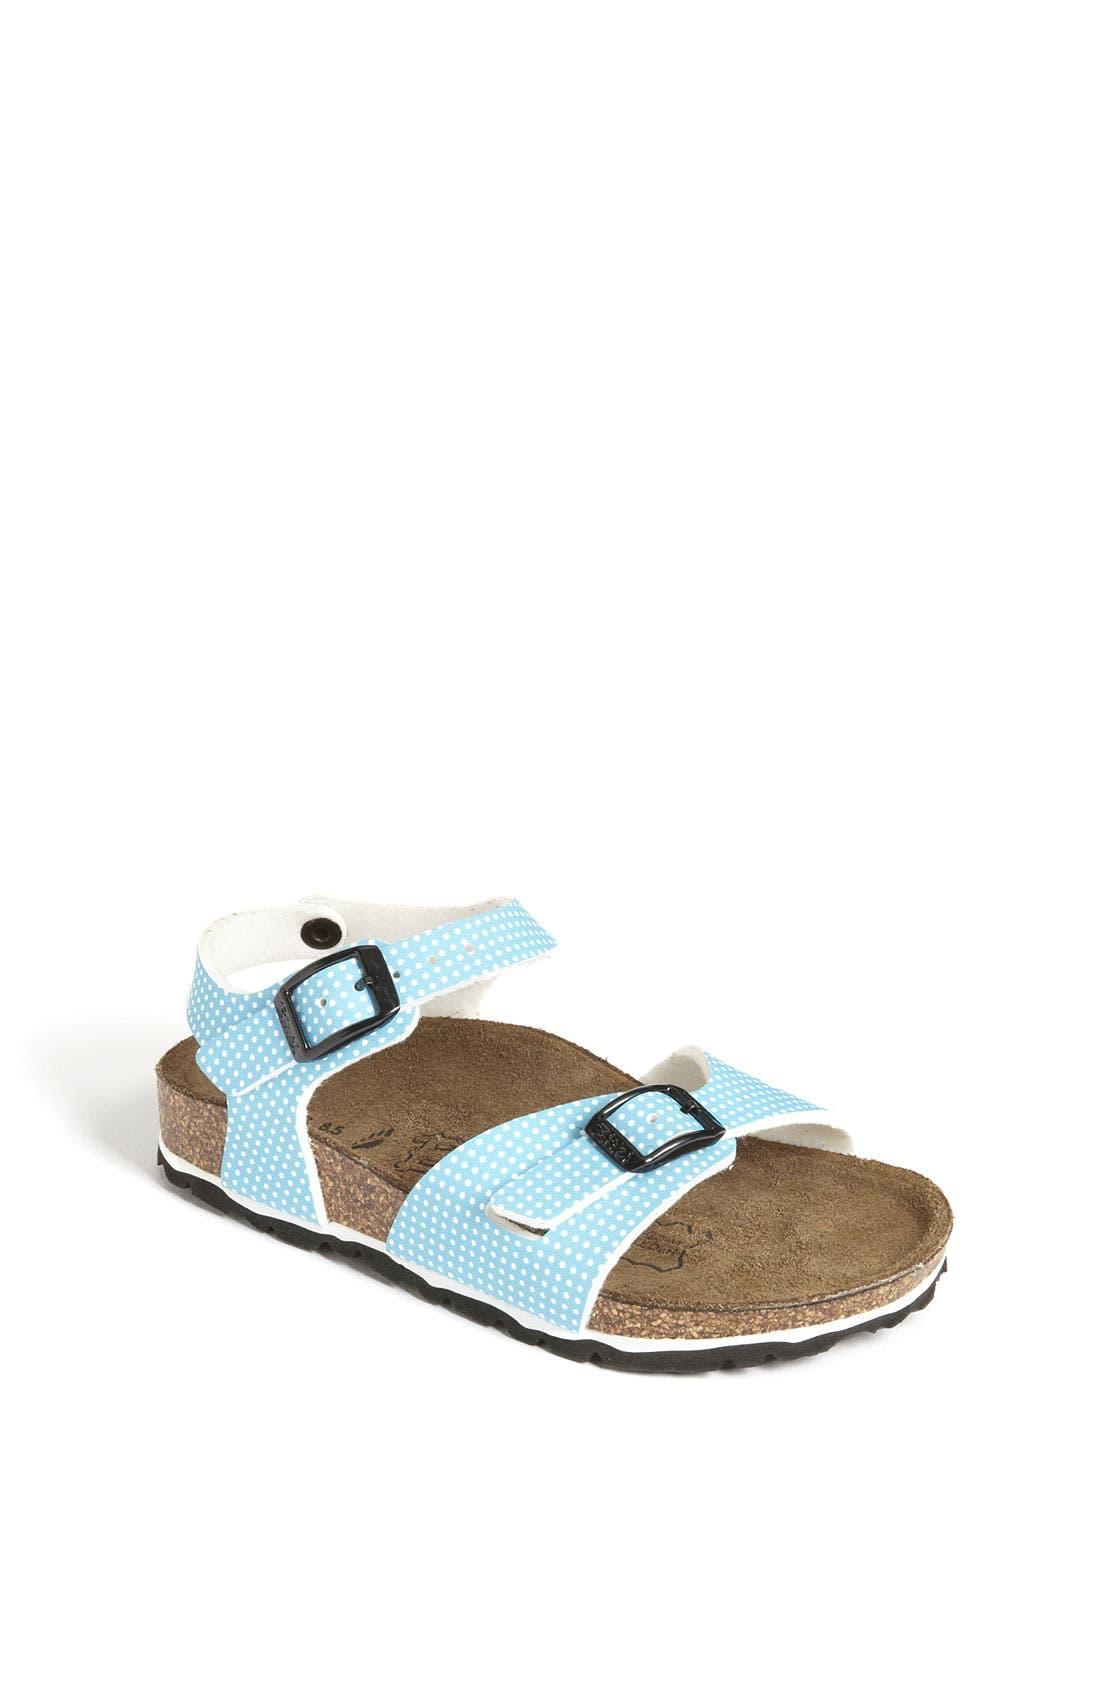 Main Image - Birki's® 'Tuvalu' Sandal (Toddler & Little Kid)